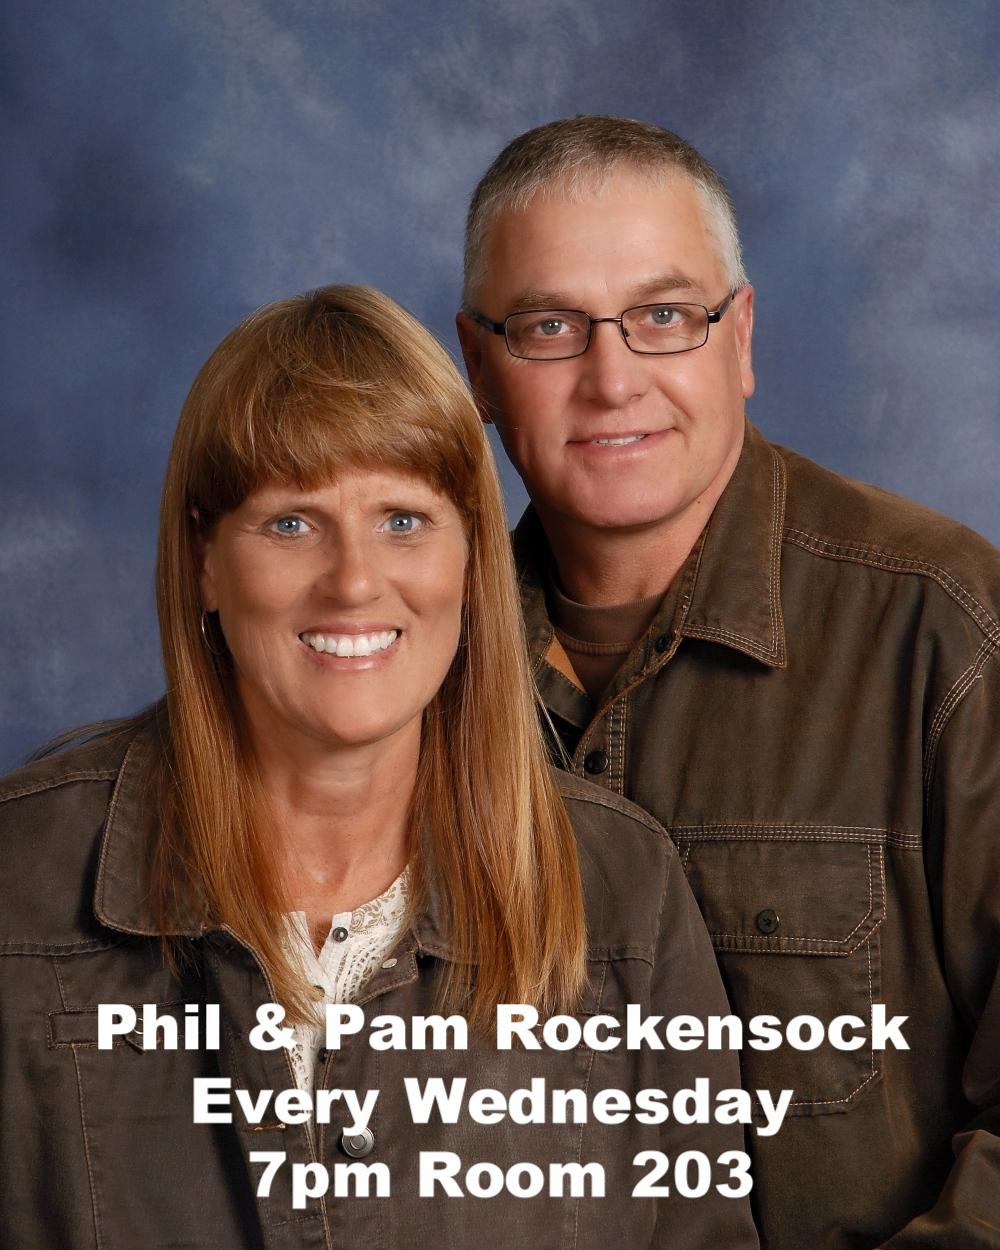 ROCKENSOCK, Phillip & Pamela.jpg